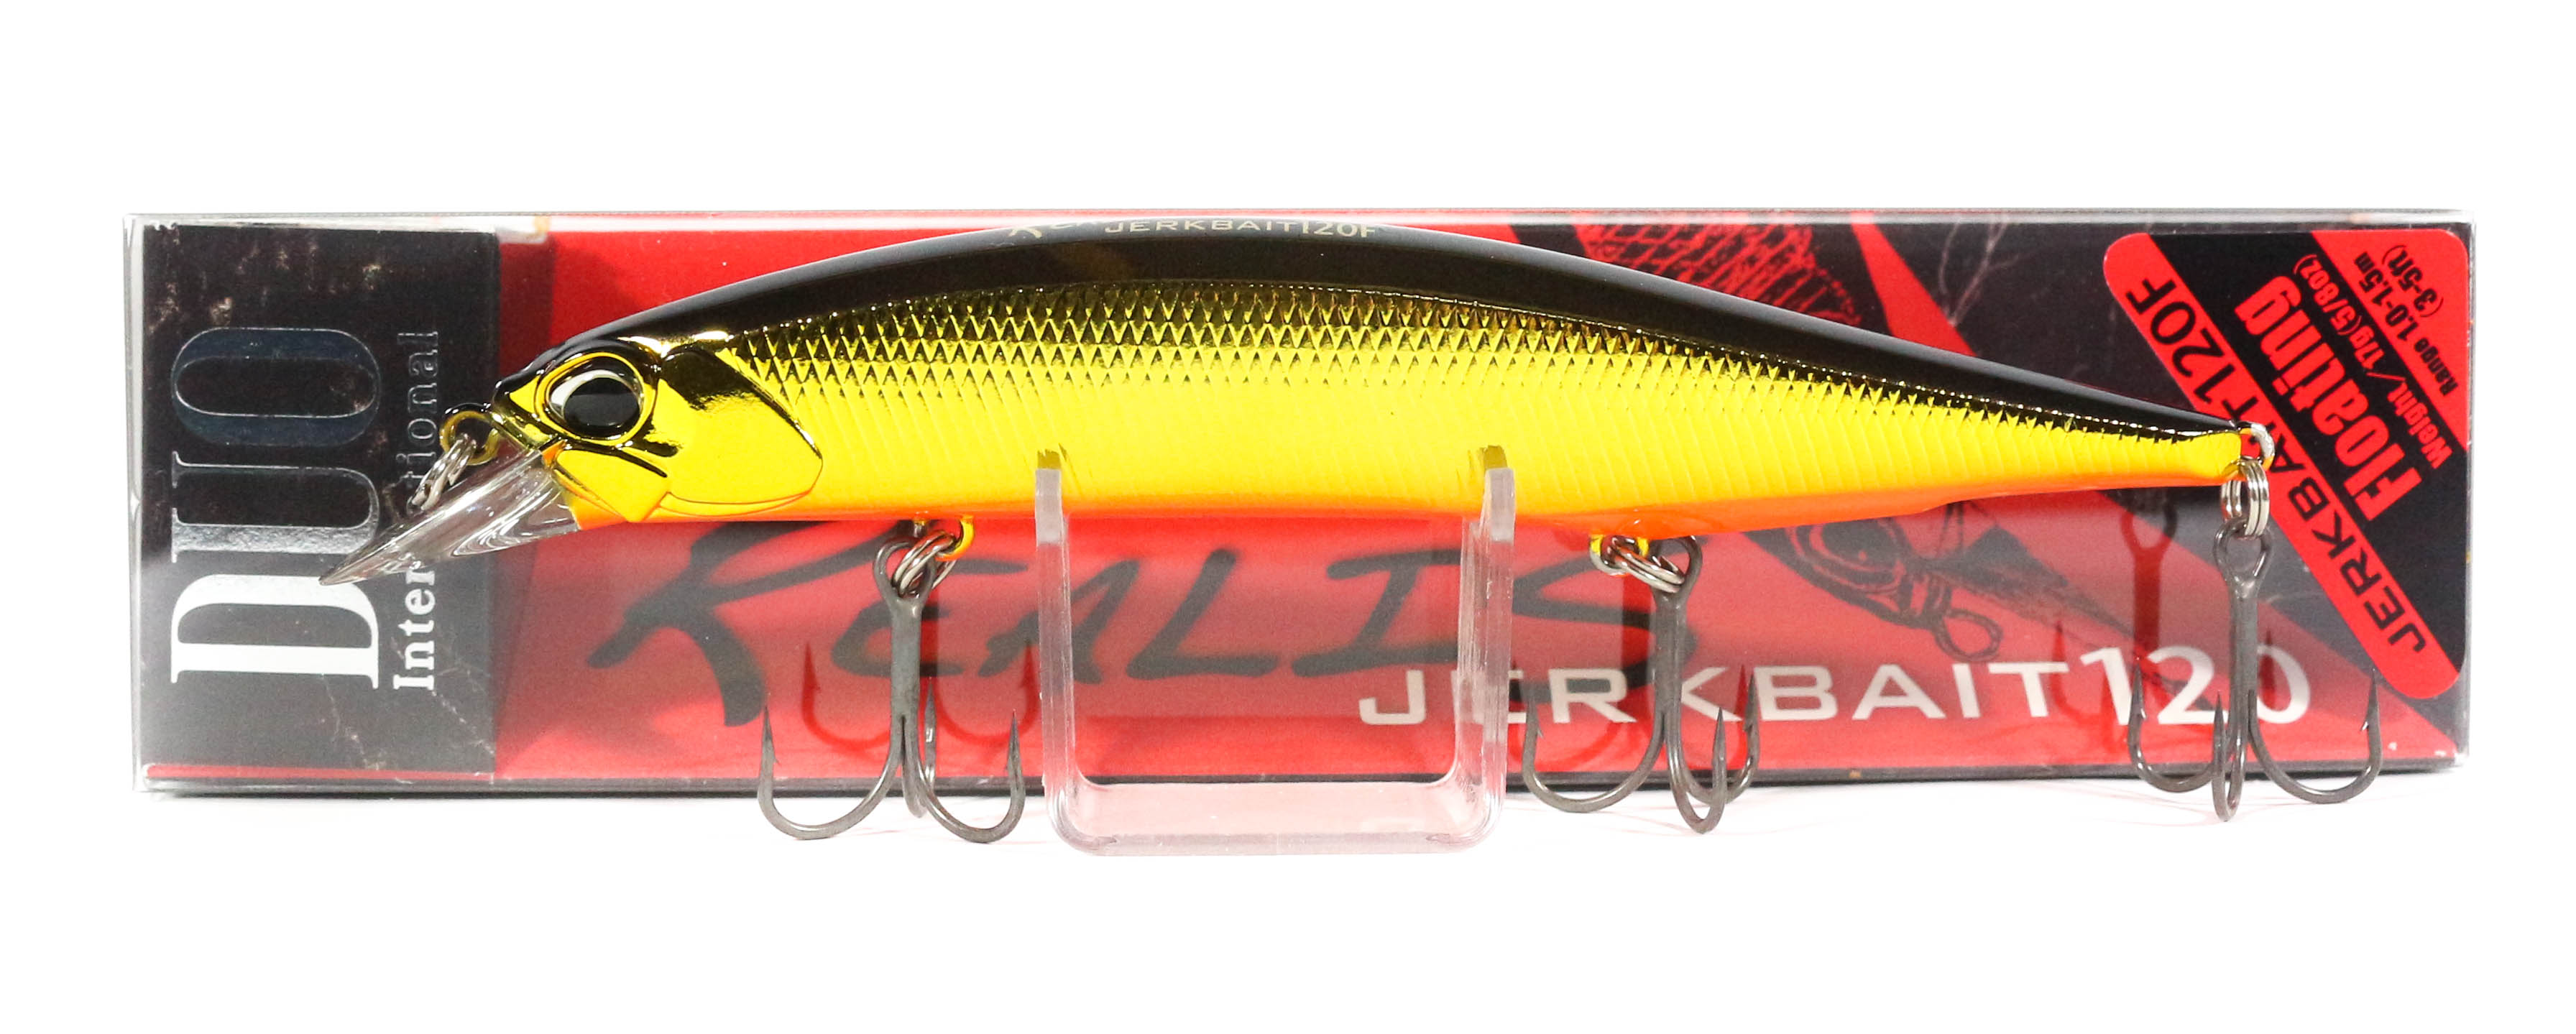 Duo Realis Jerkbait 120F Floating Lure MCC4054 (7777)